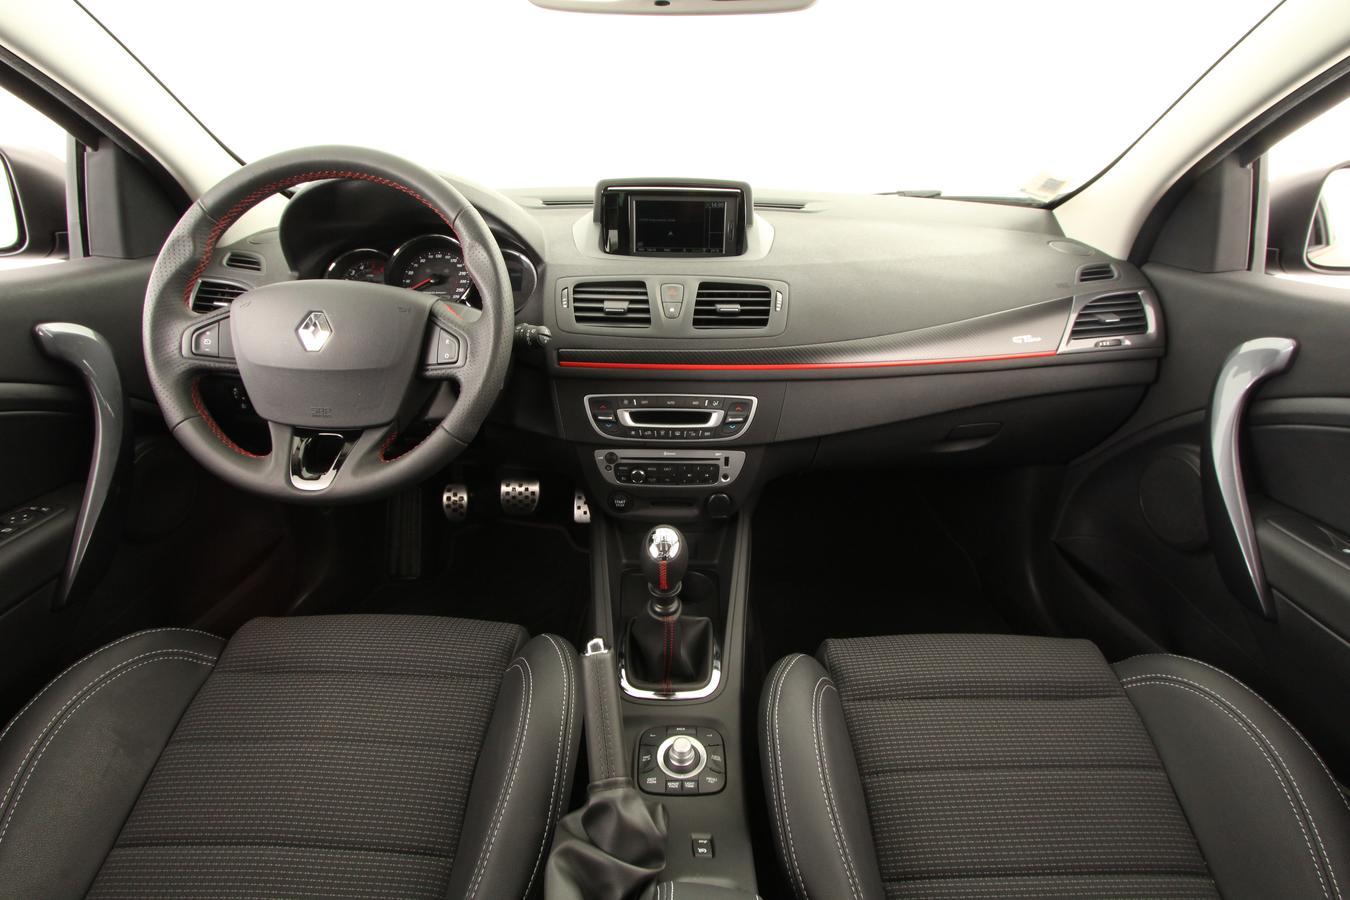 renault m gane 3 coup berline compacte 3 portes diesel dci 130 bo te manuelle. Black Bedroom Furniture Sets. Home Design Ideas